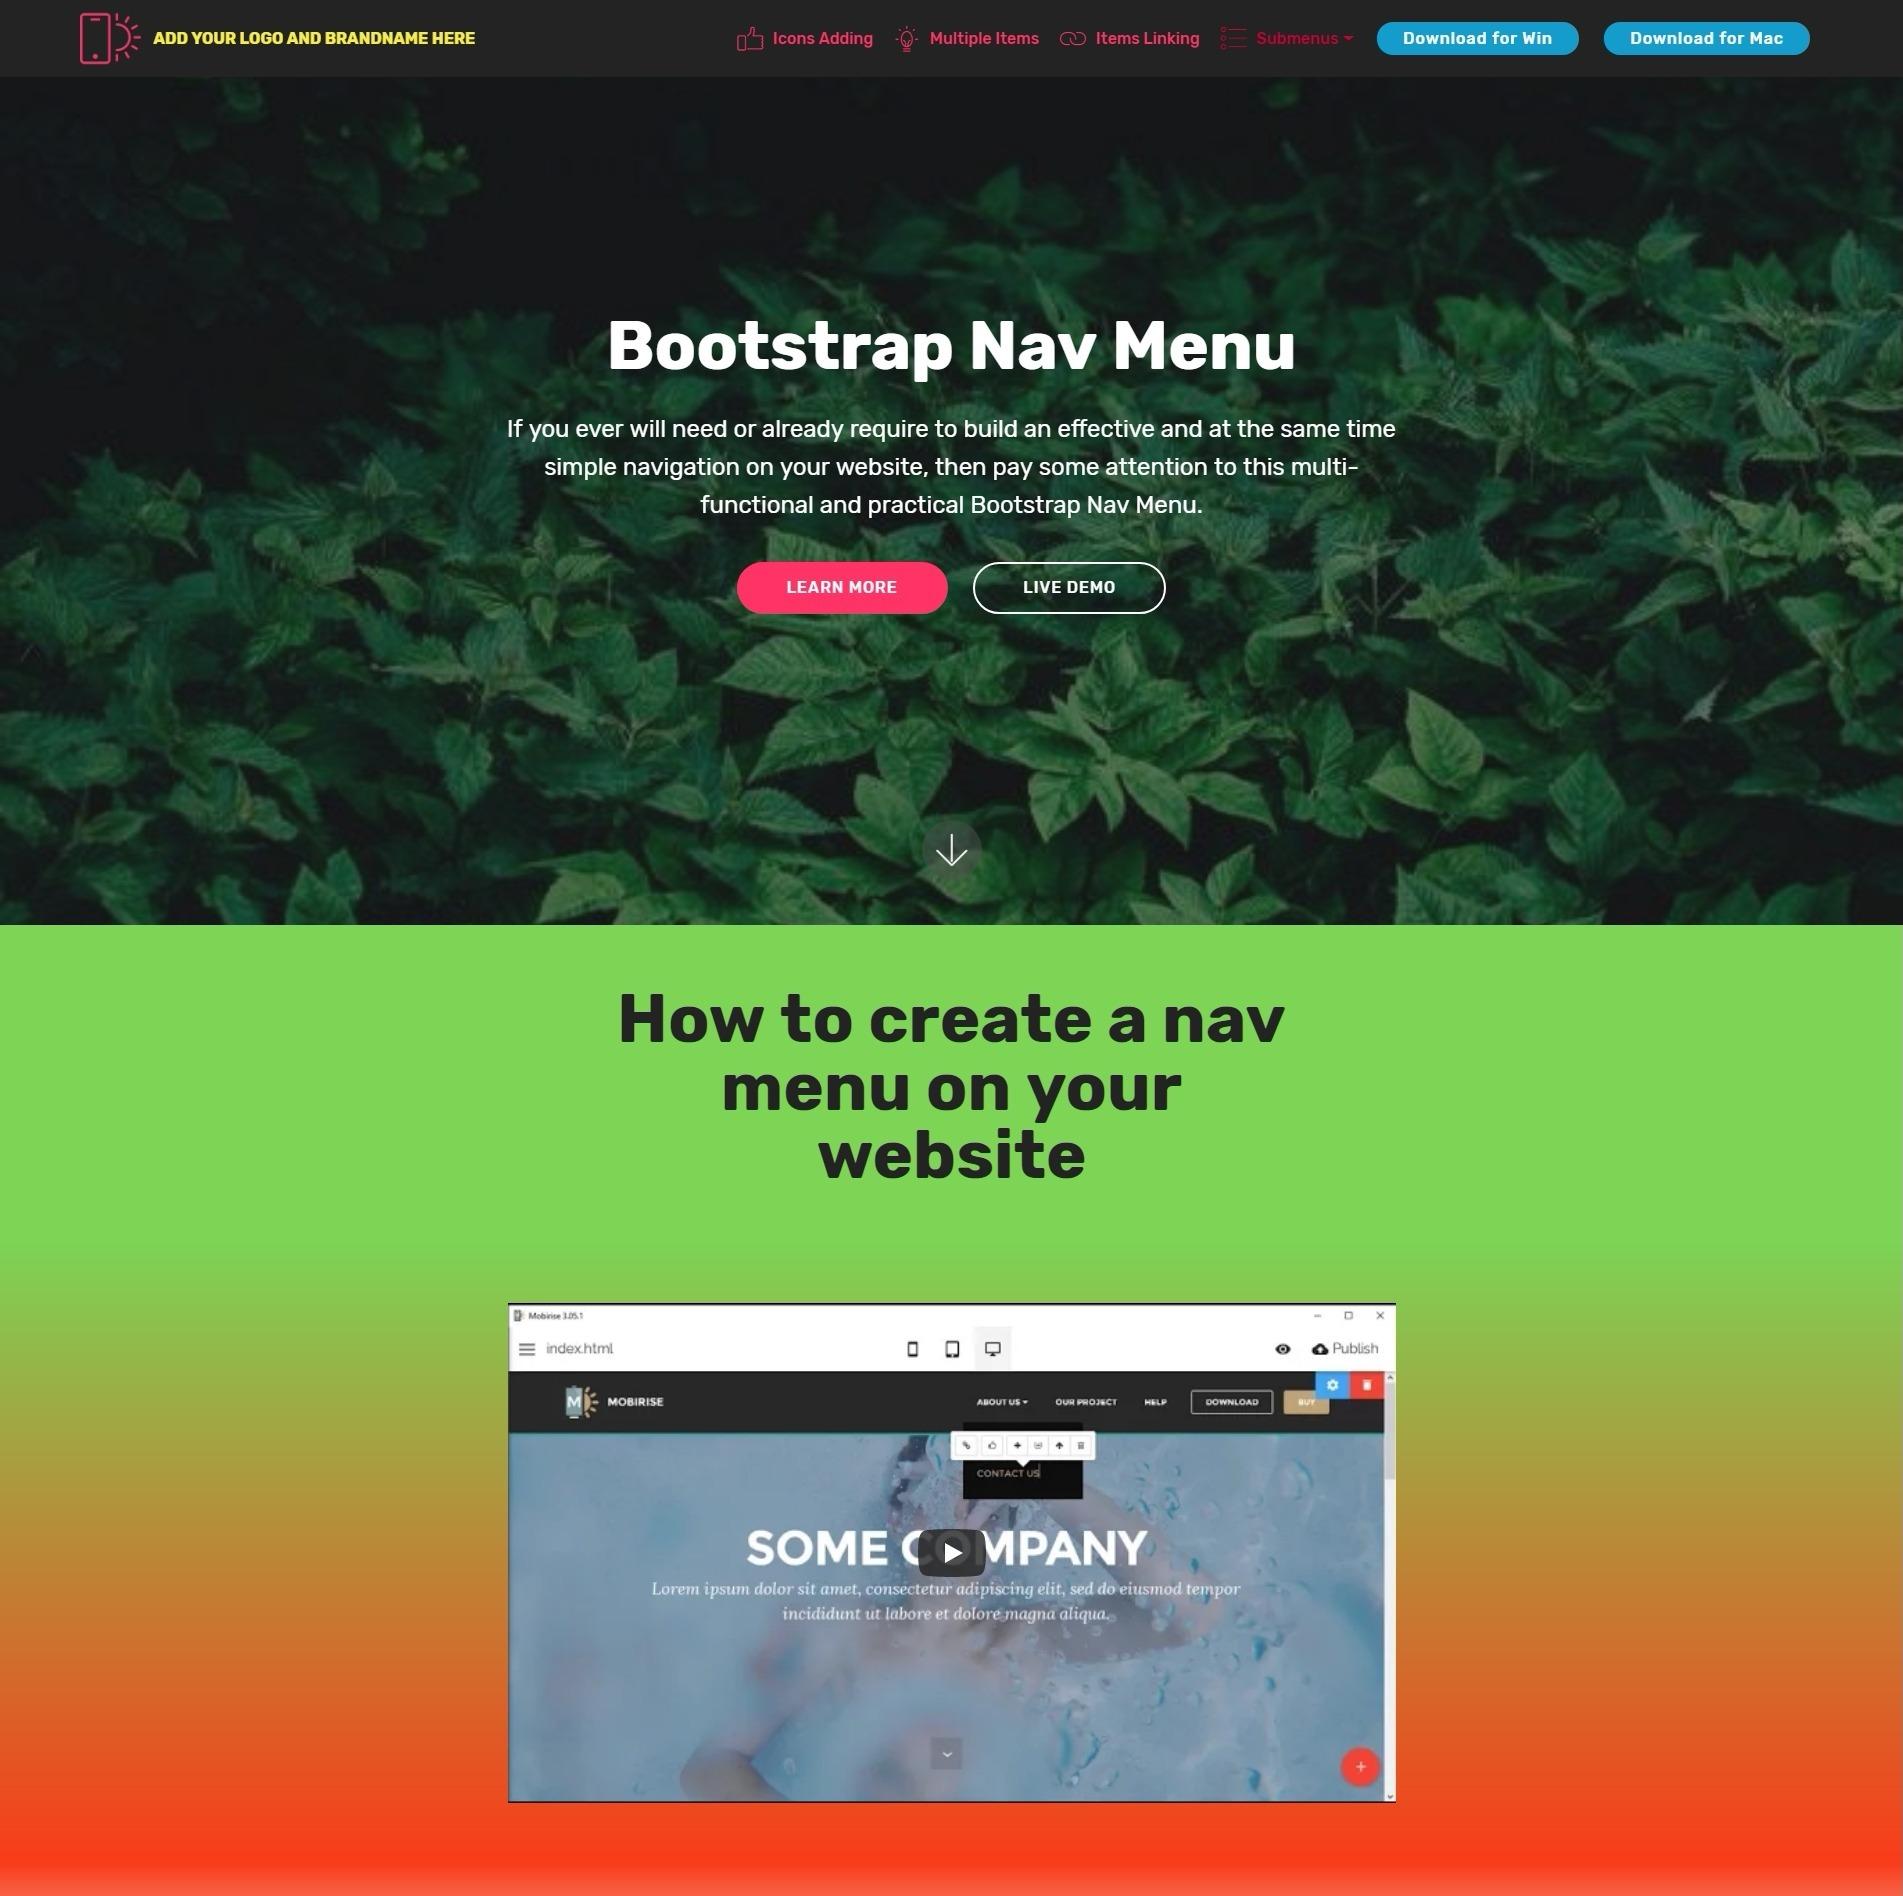 Bootstrap Nav Menu